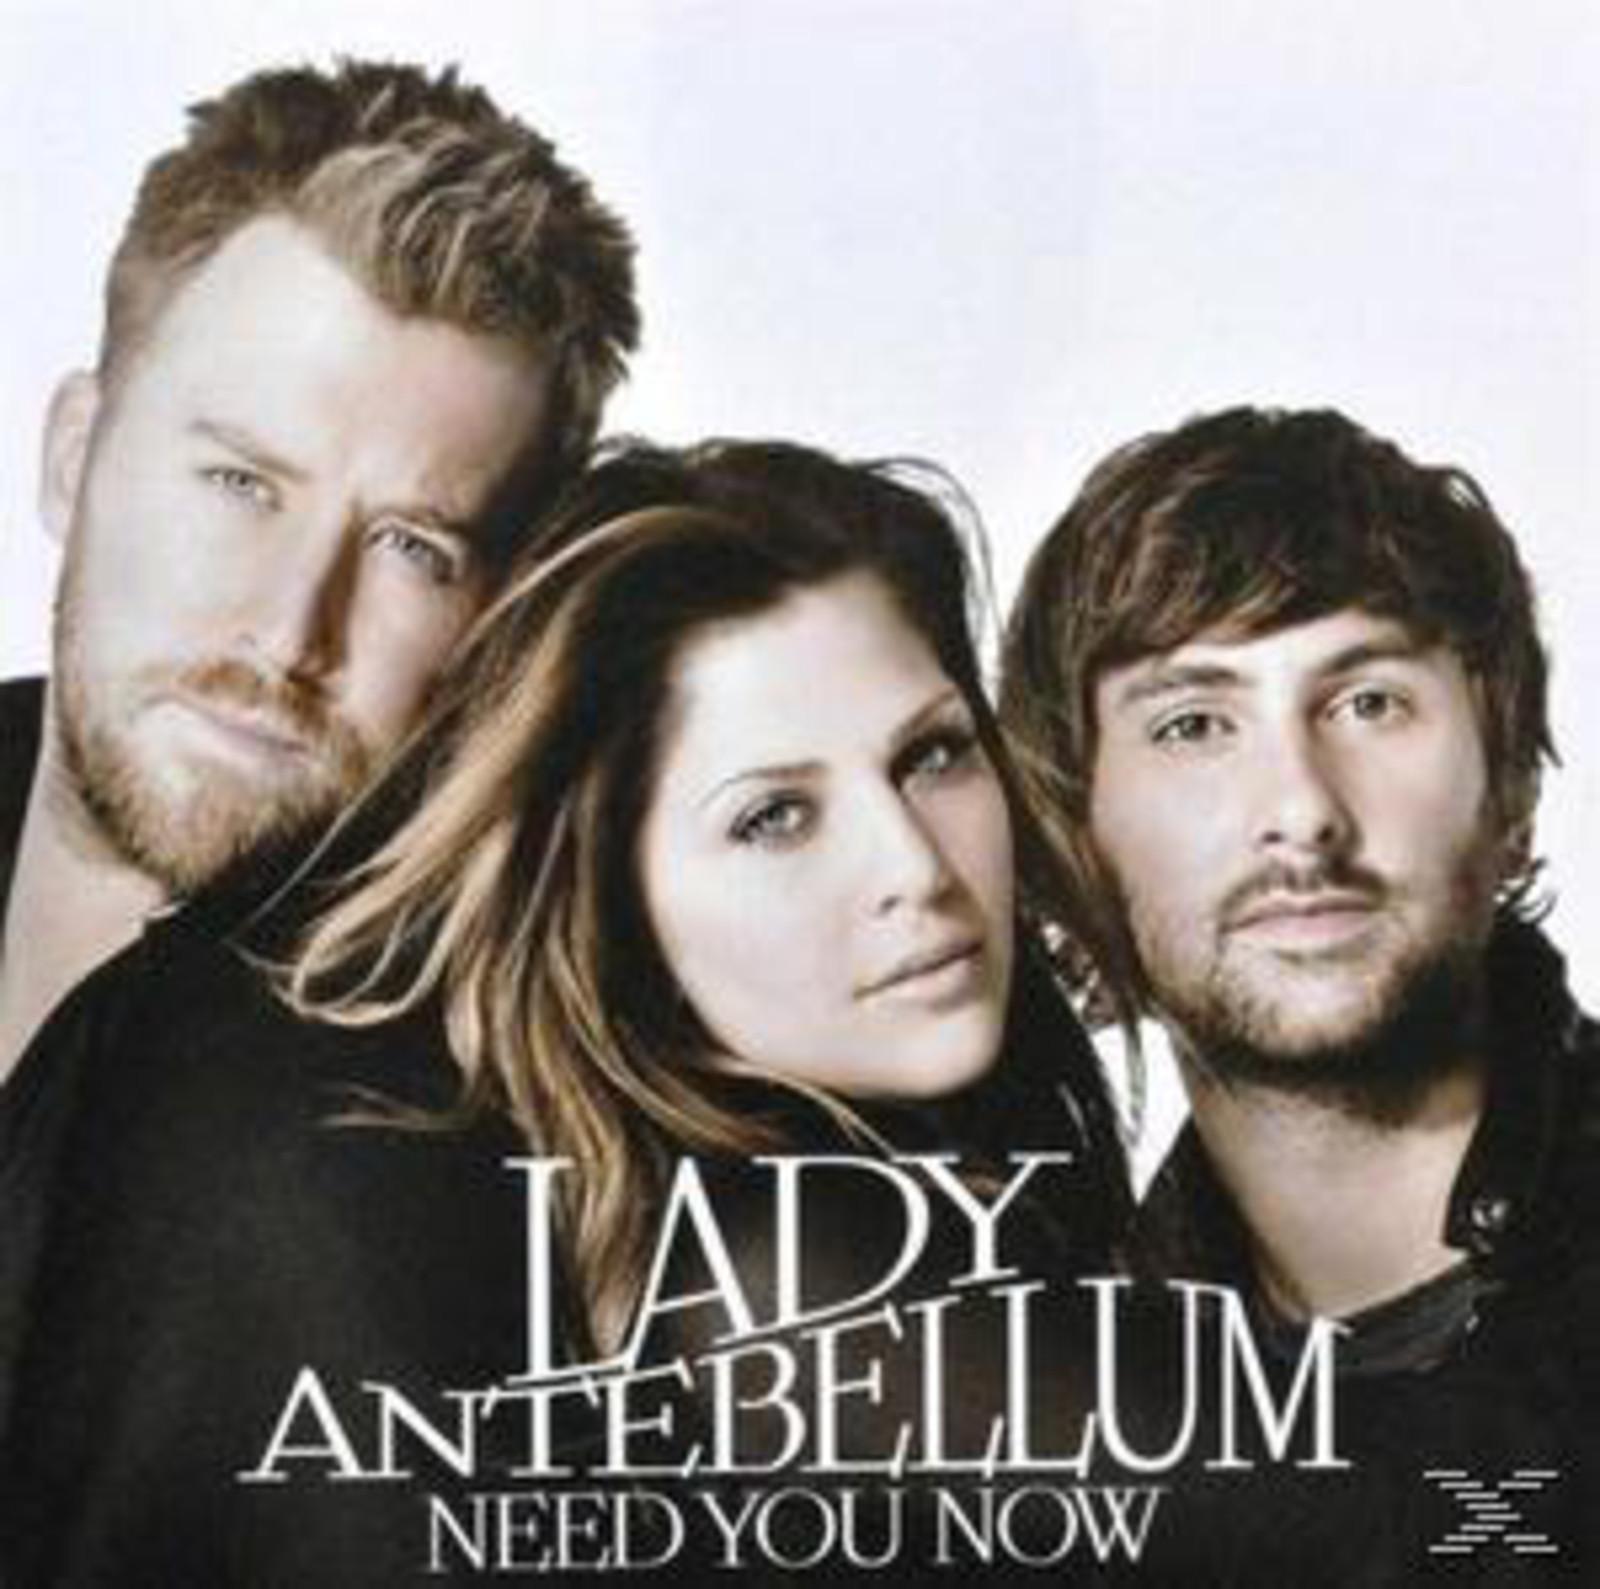 Lady Antebellum - Lady Antebellum - Need You Now [CD] 6